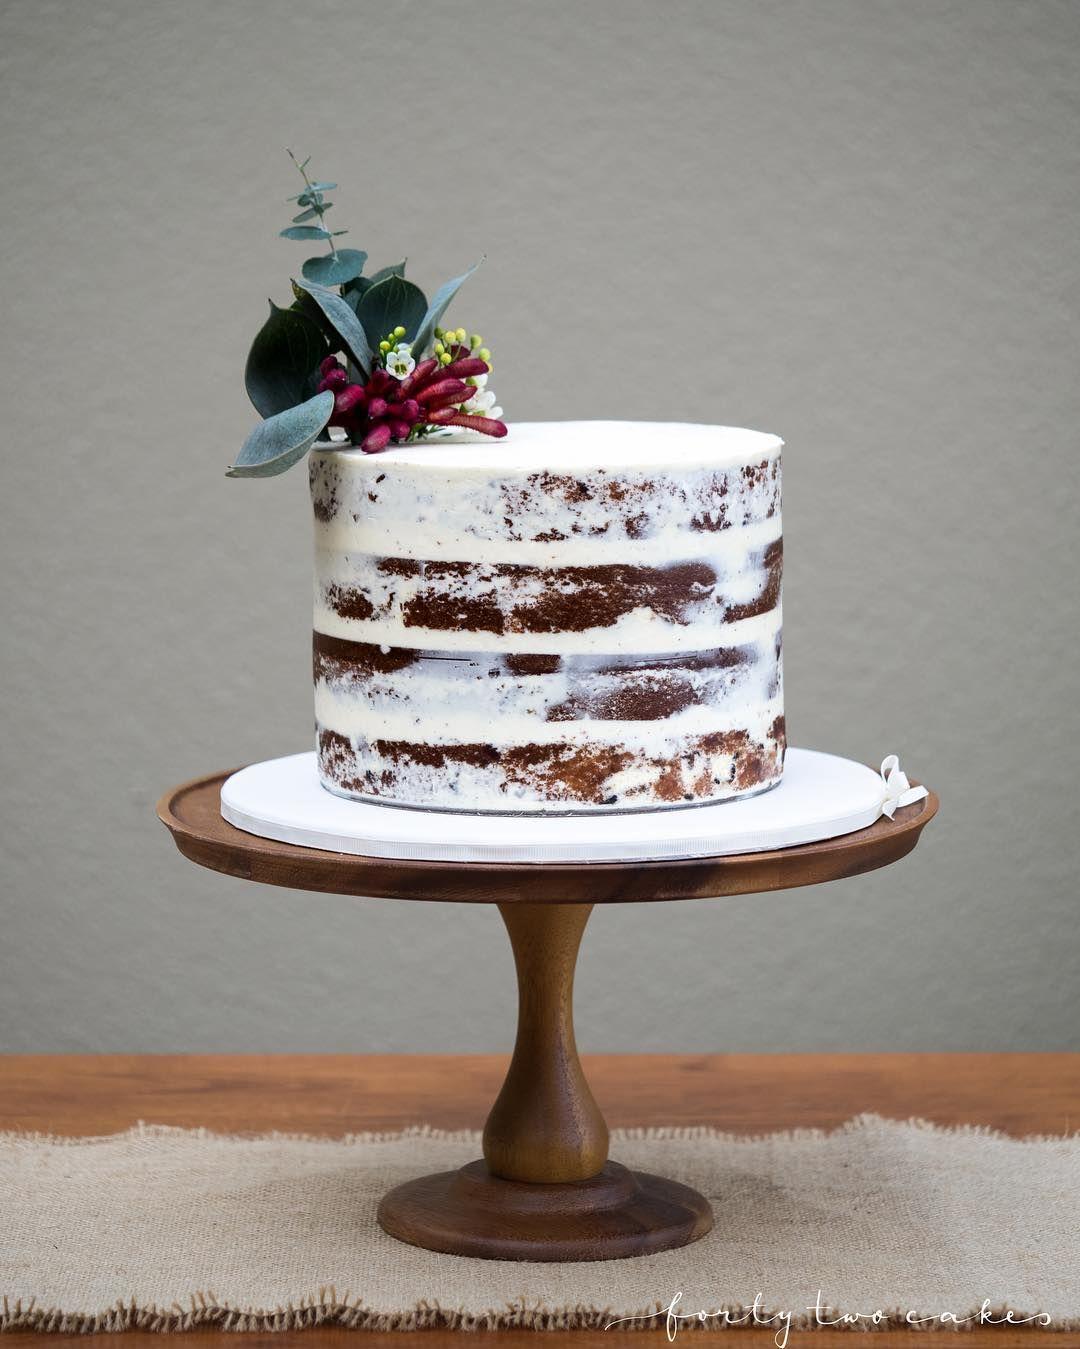 Fortytwo cakes fortytwocakes u fotos e vídeos do instagram